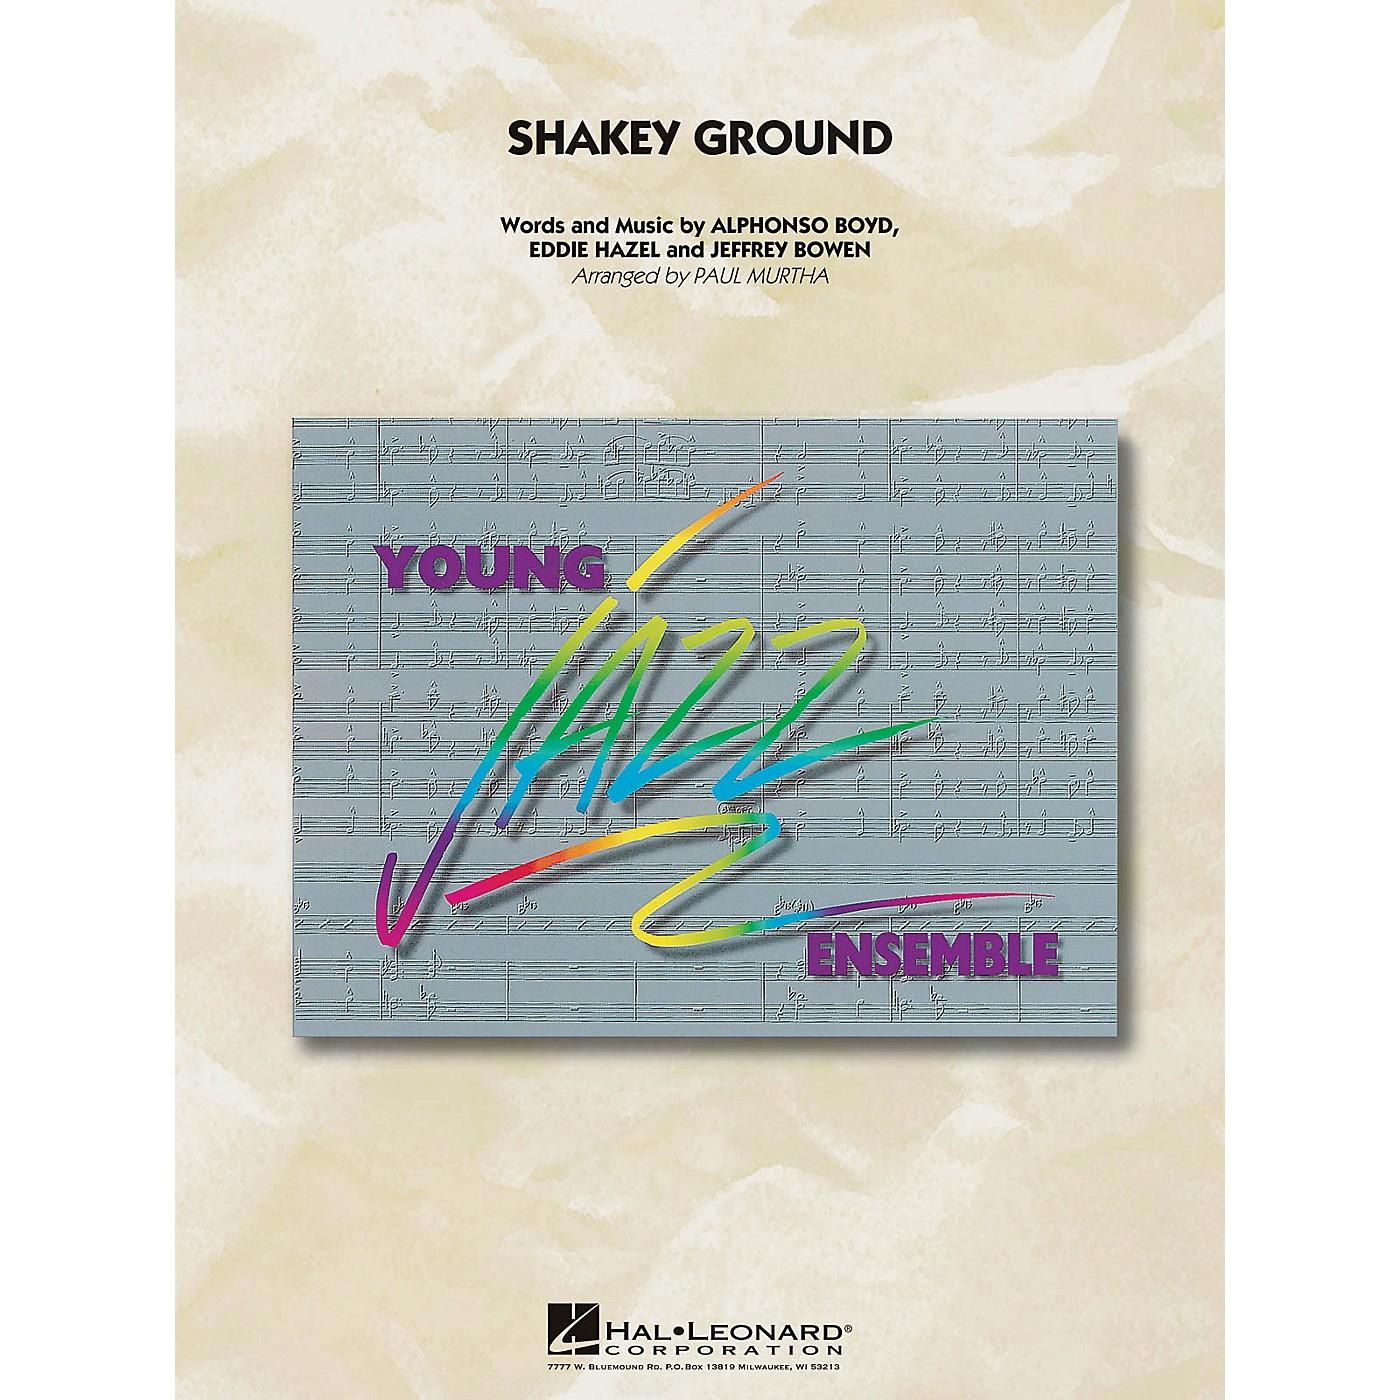 Hal Leonard Shakey Ground Jazz Band Level 3 by The Temptations Arranged by Paul Murtha thumbnail